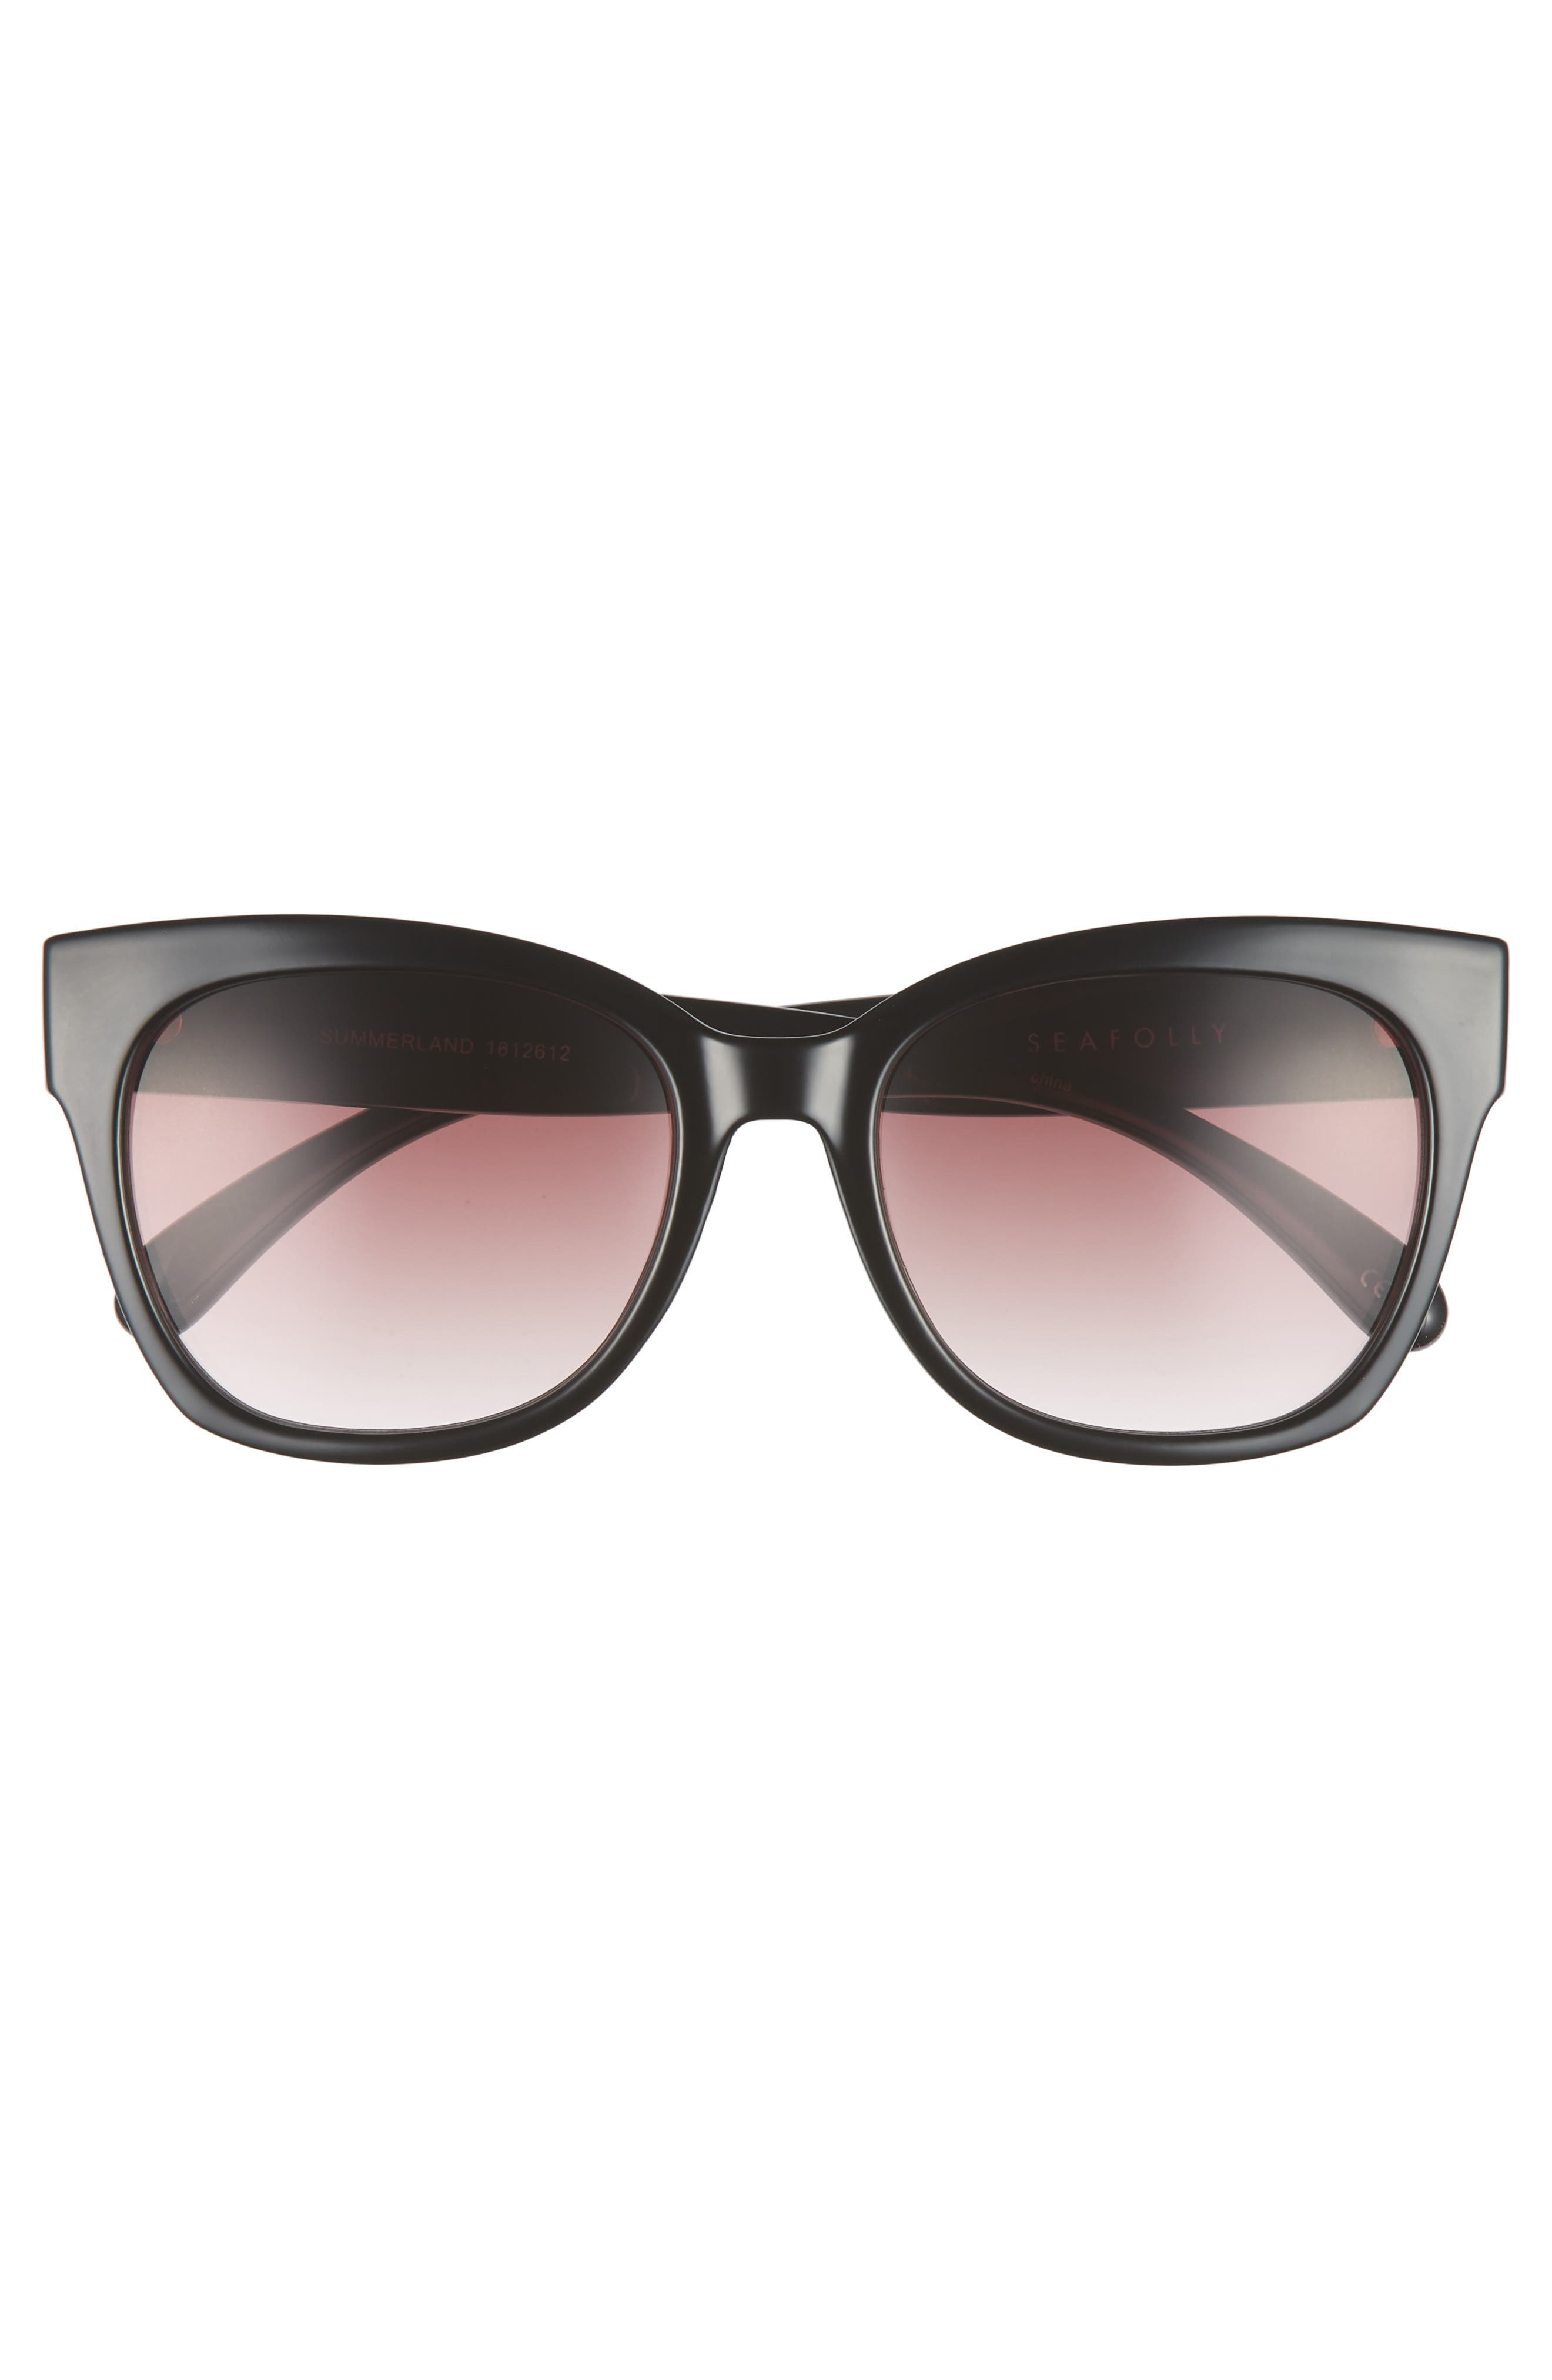 Summerland 55mm Cat Eye Sunglasses,                             Alternate thumbnail 3, color,                             BLACK